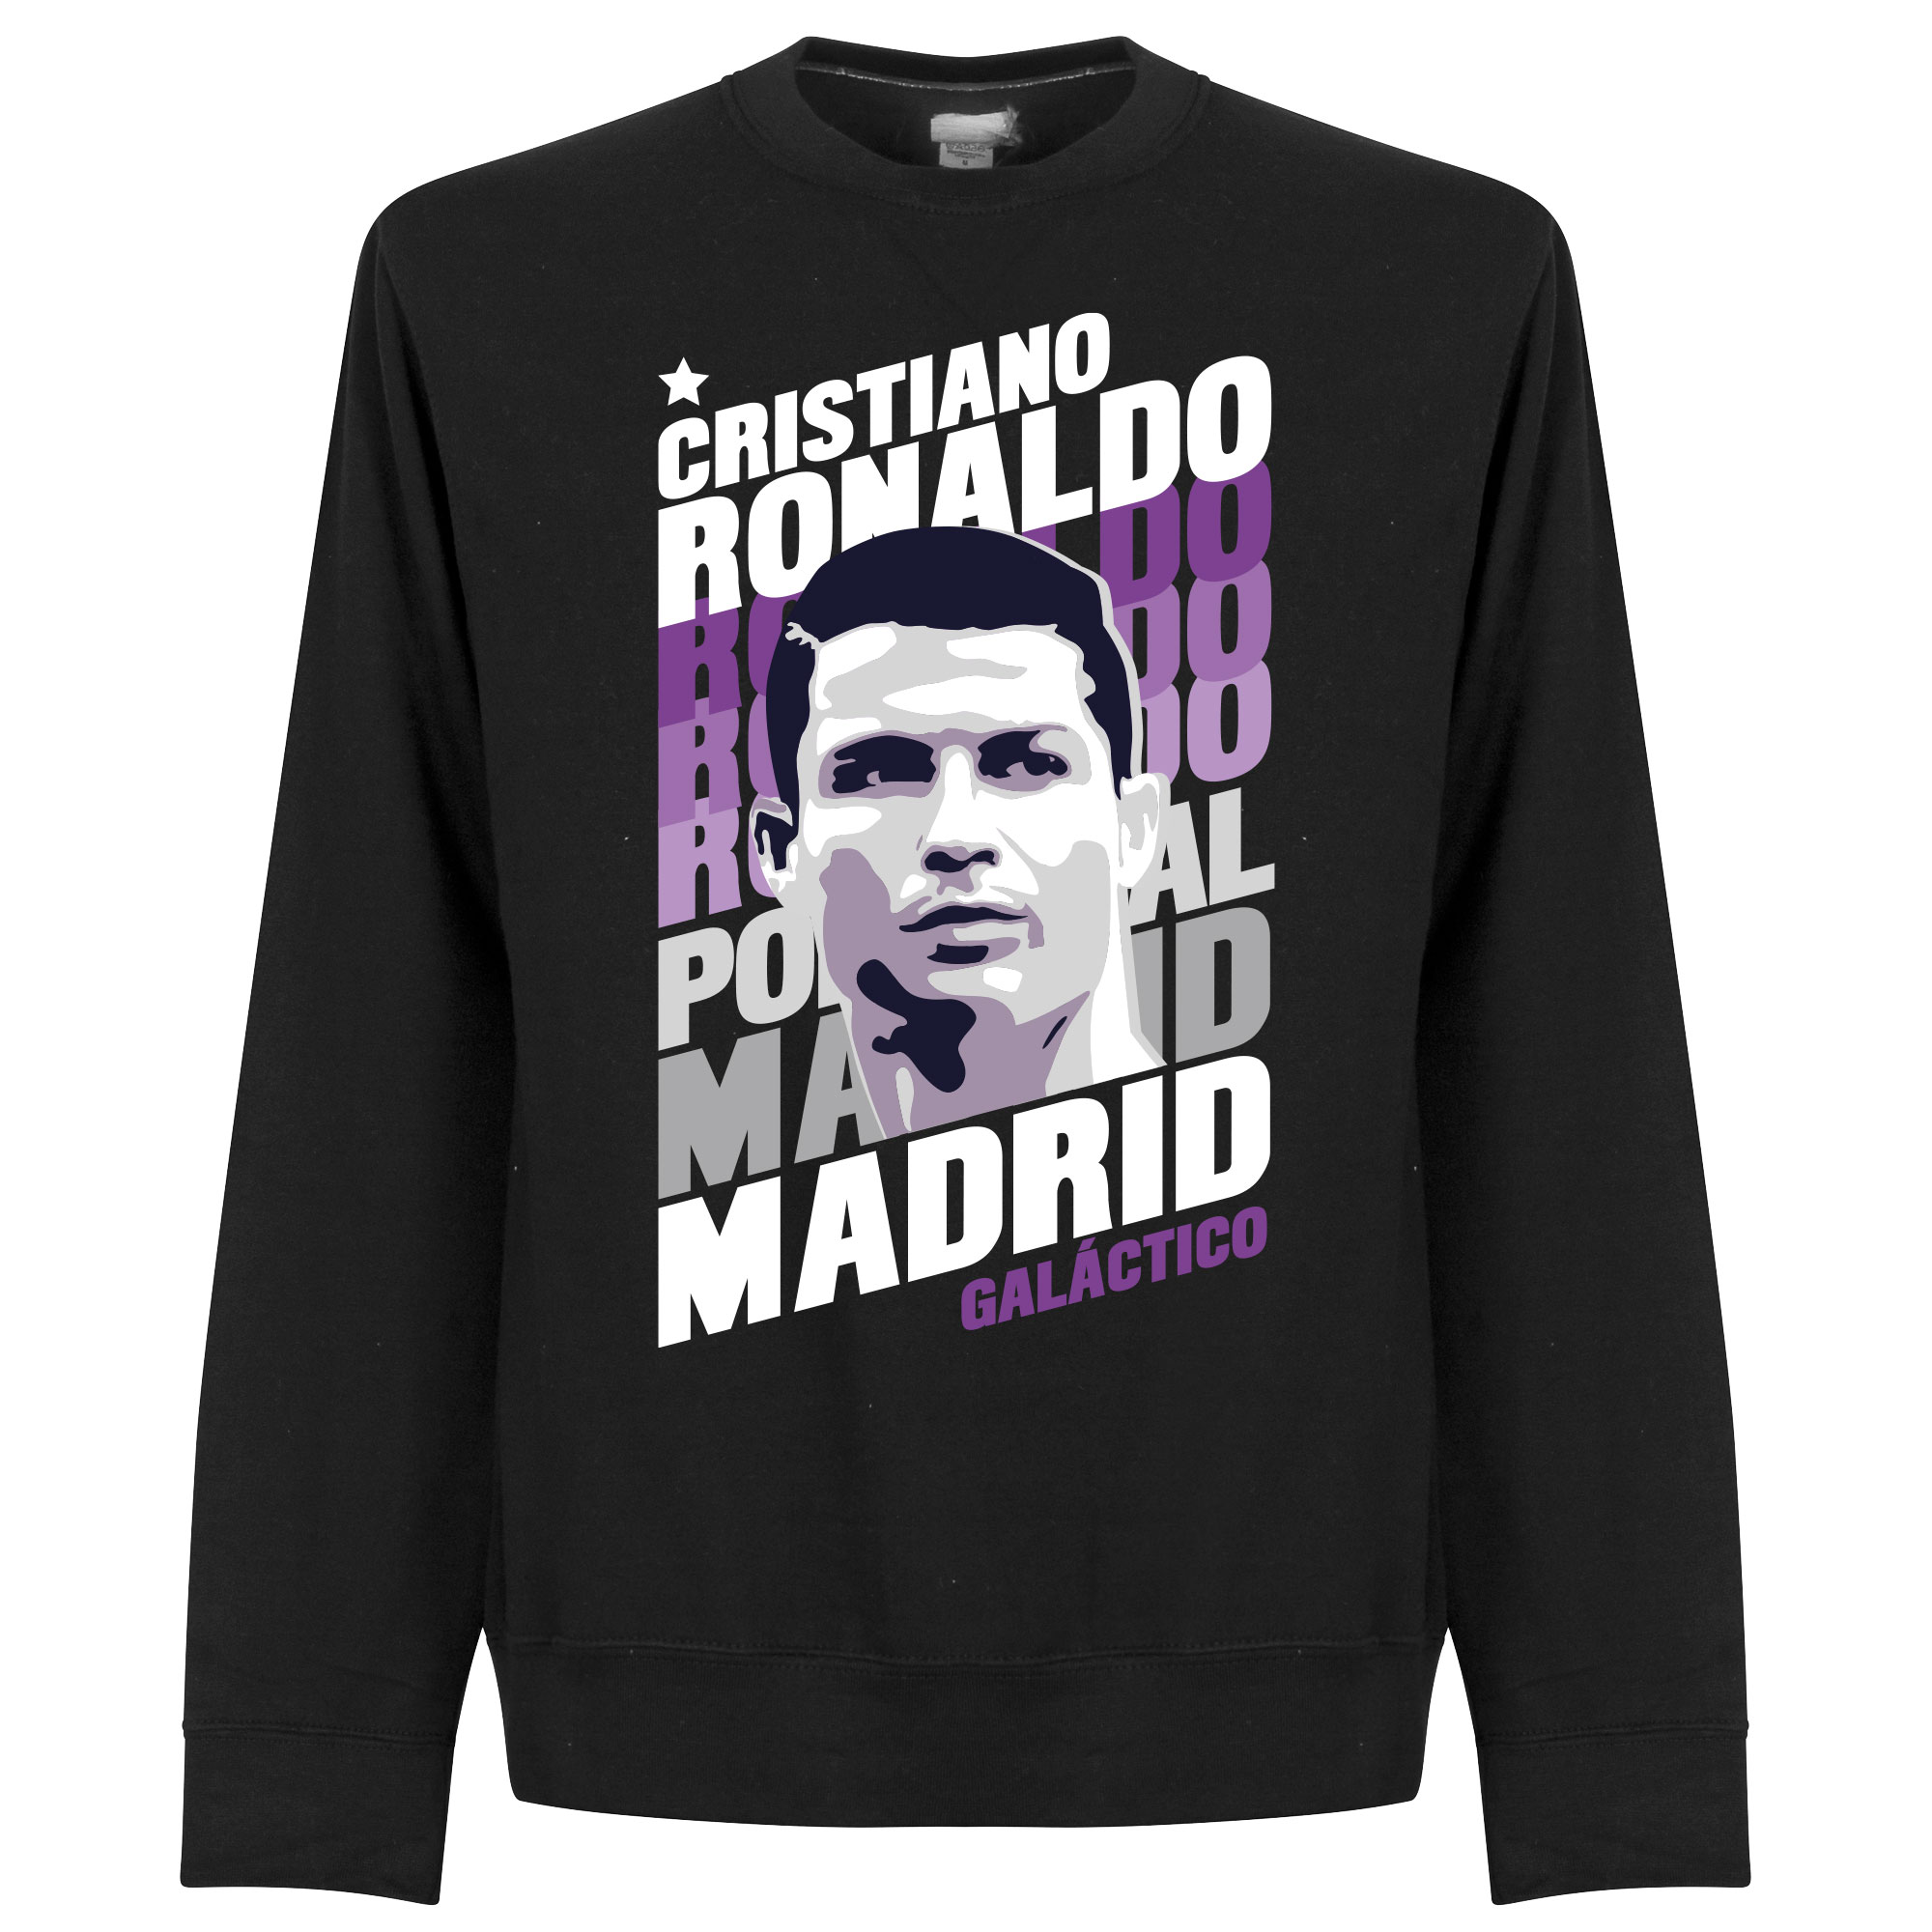 Ronaldo Madrid Portrait Sweatshirt - Black - XL